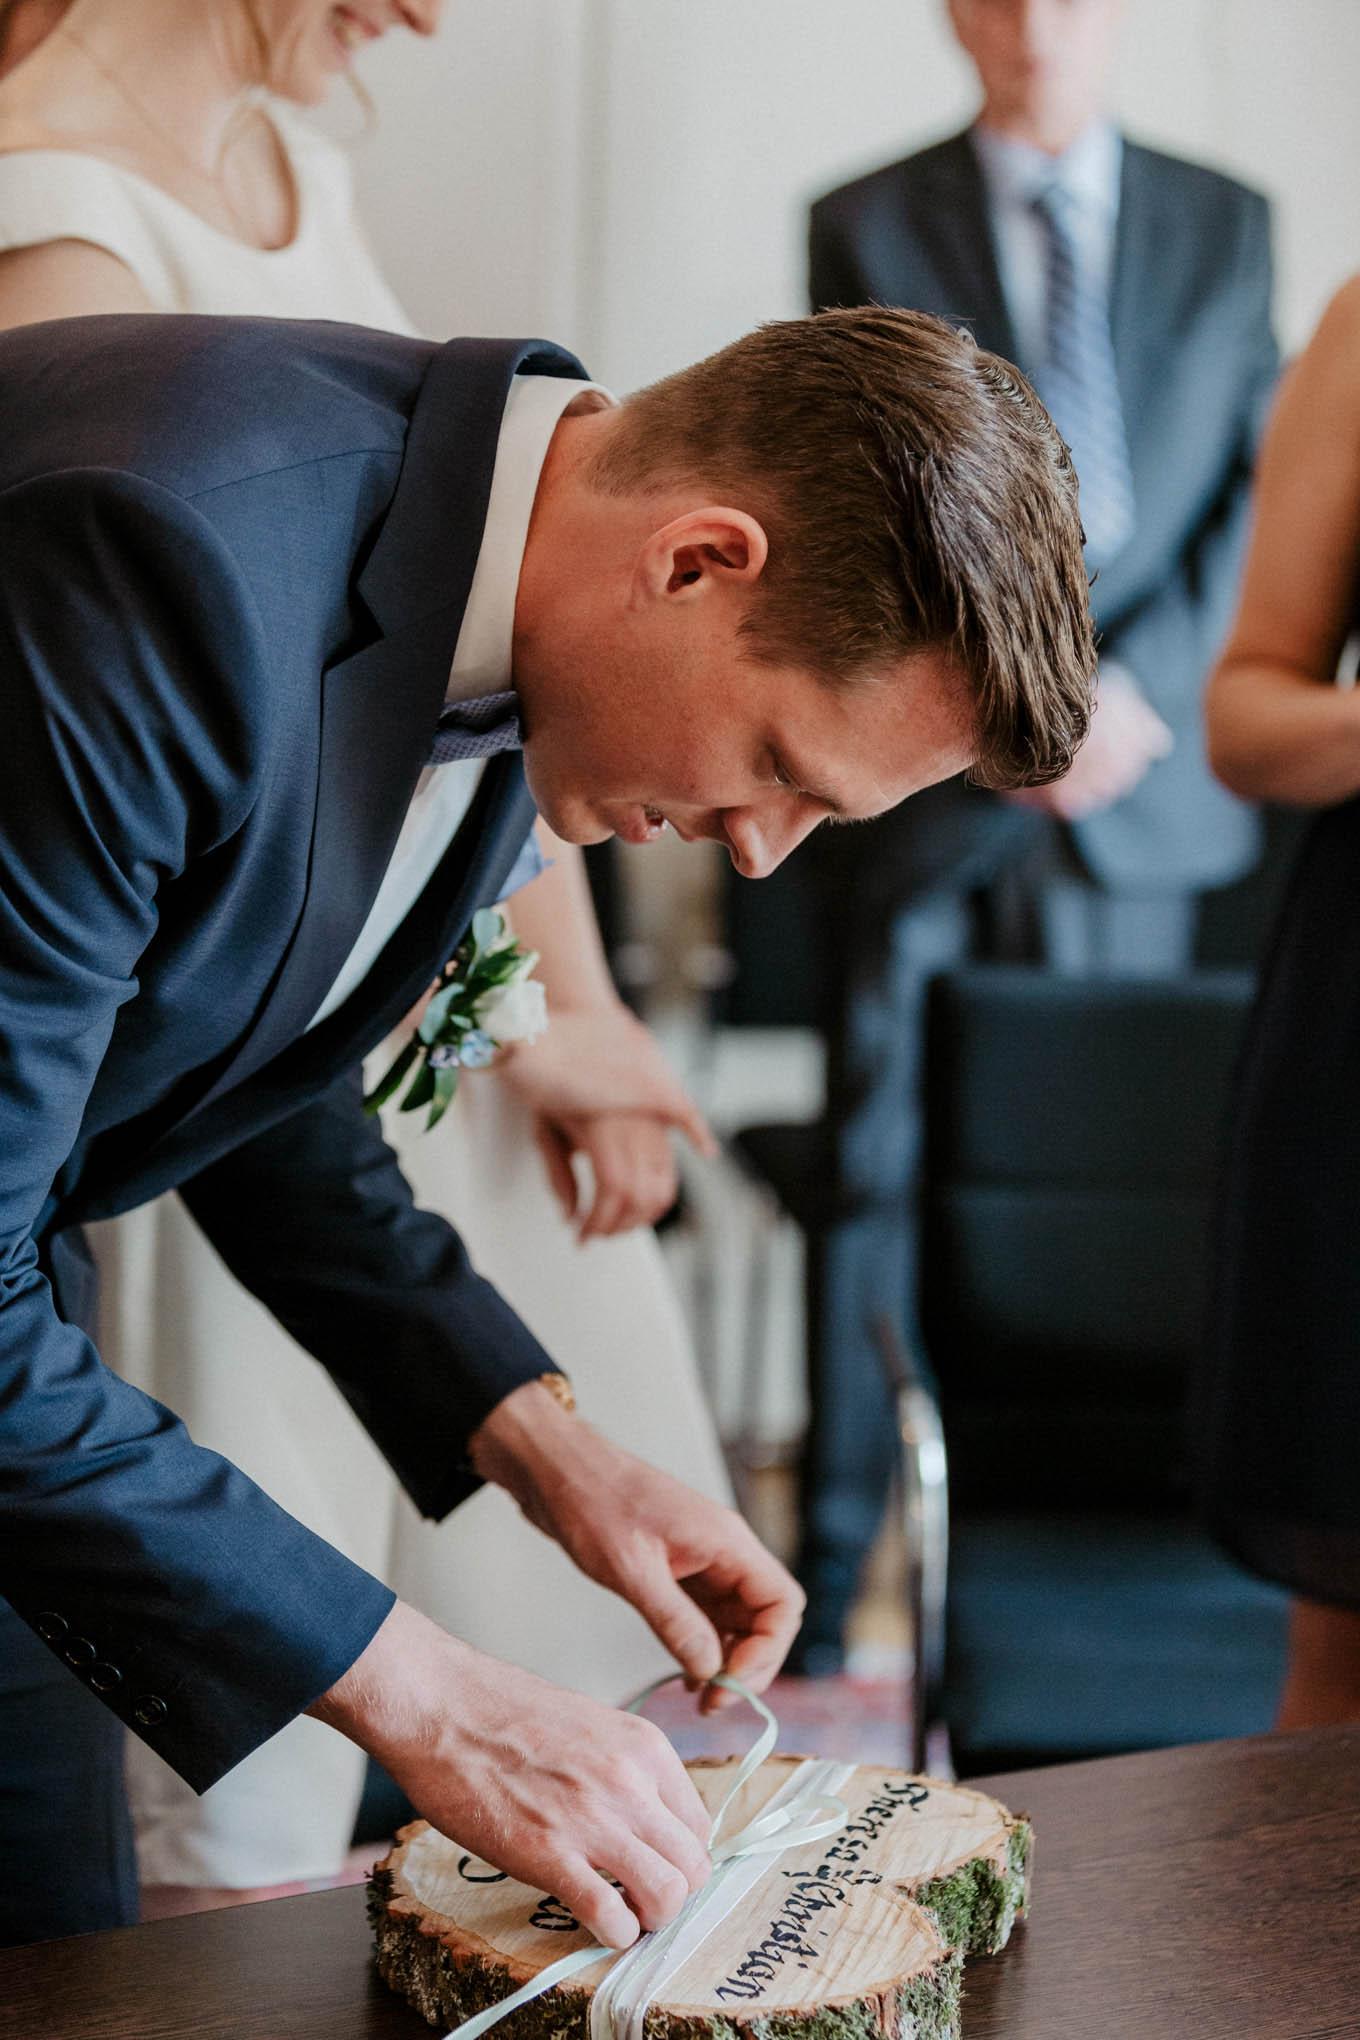 Bräutigam mit Trauringen